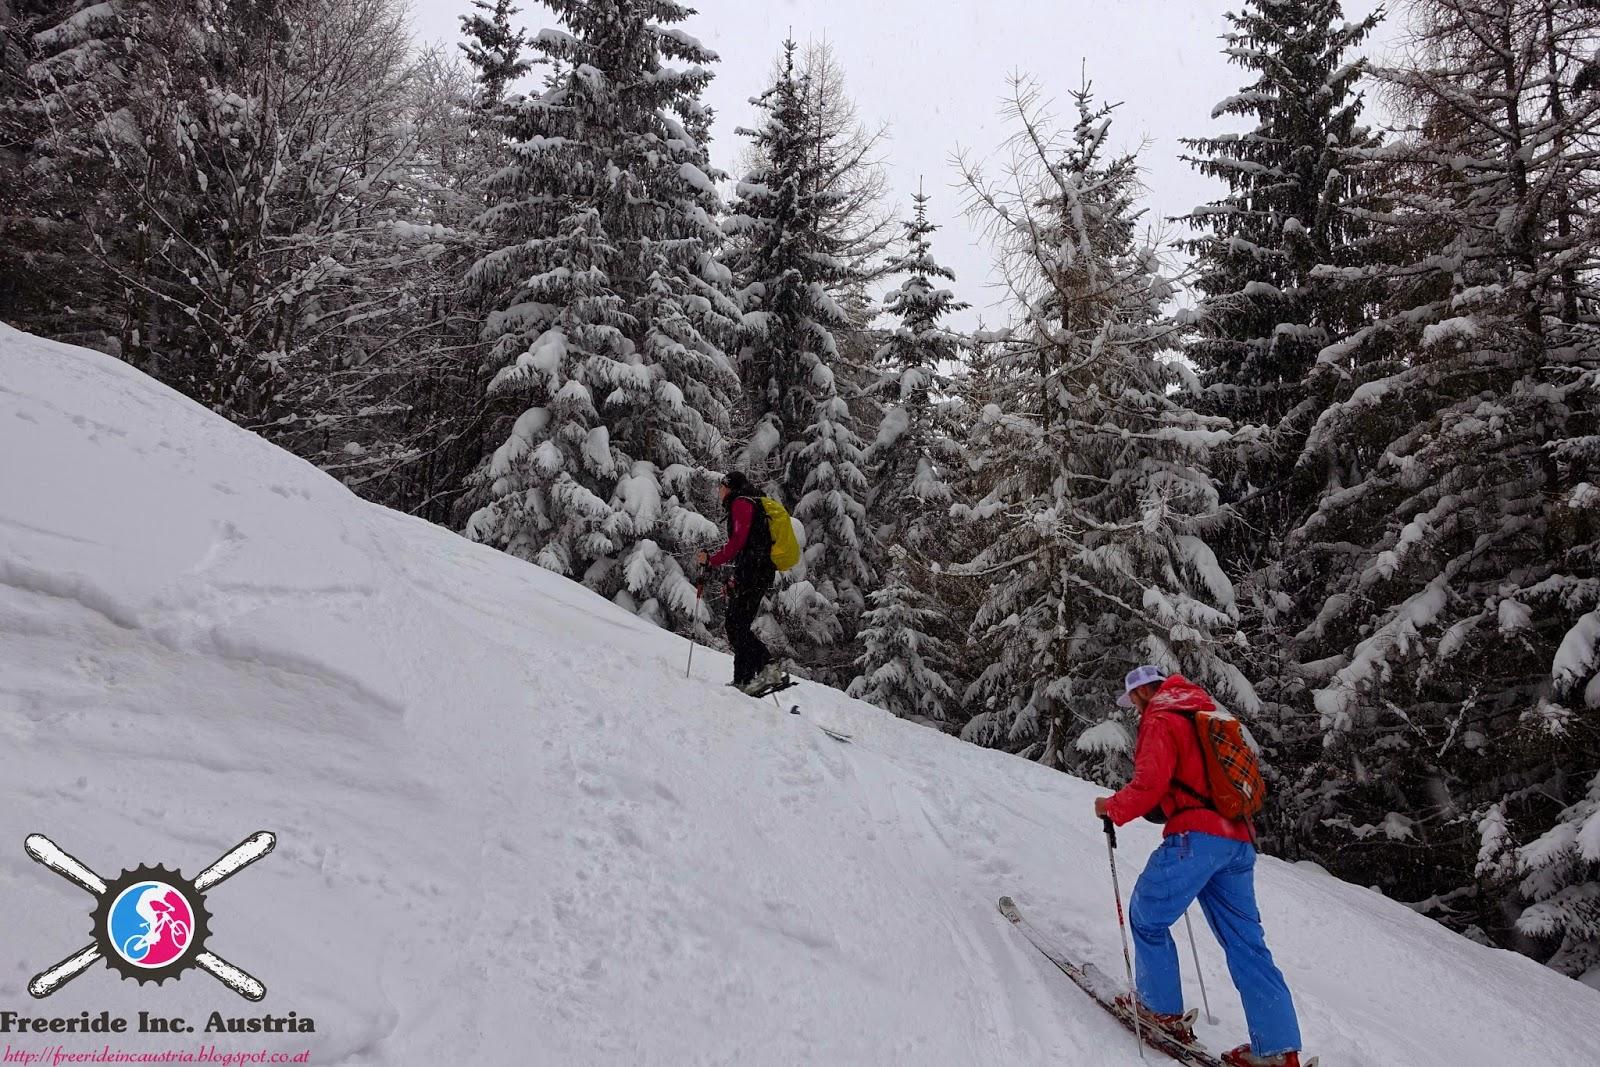 Skitouren zum nachgehen